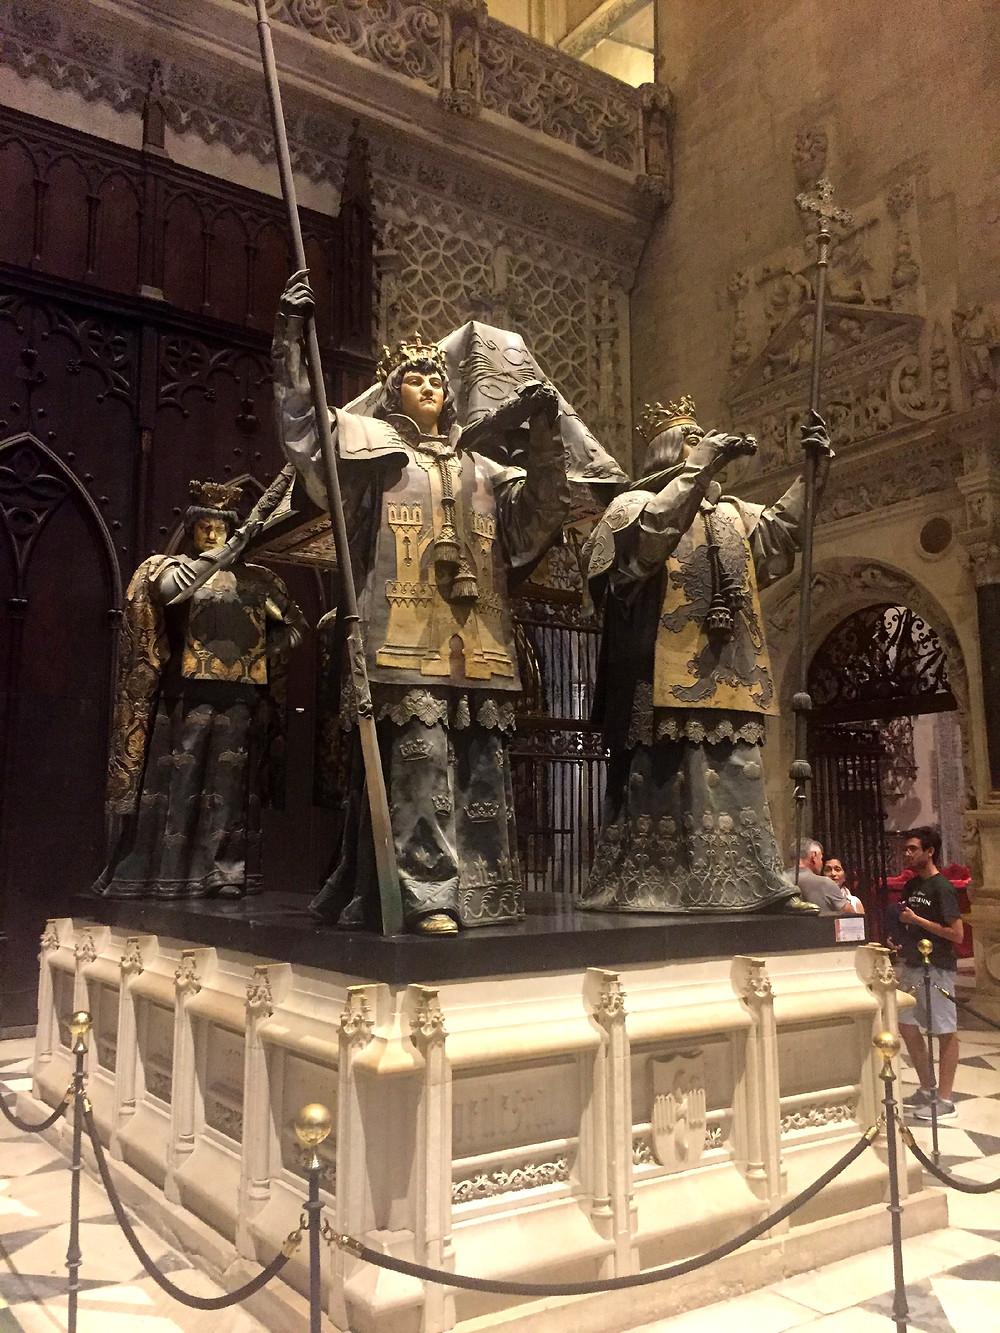 Túmulo de Cristovão Colombo - Catedral de Sevilha - Espanha